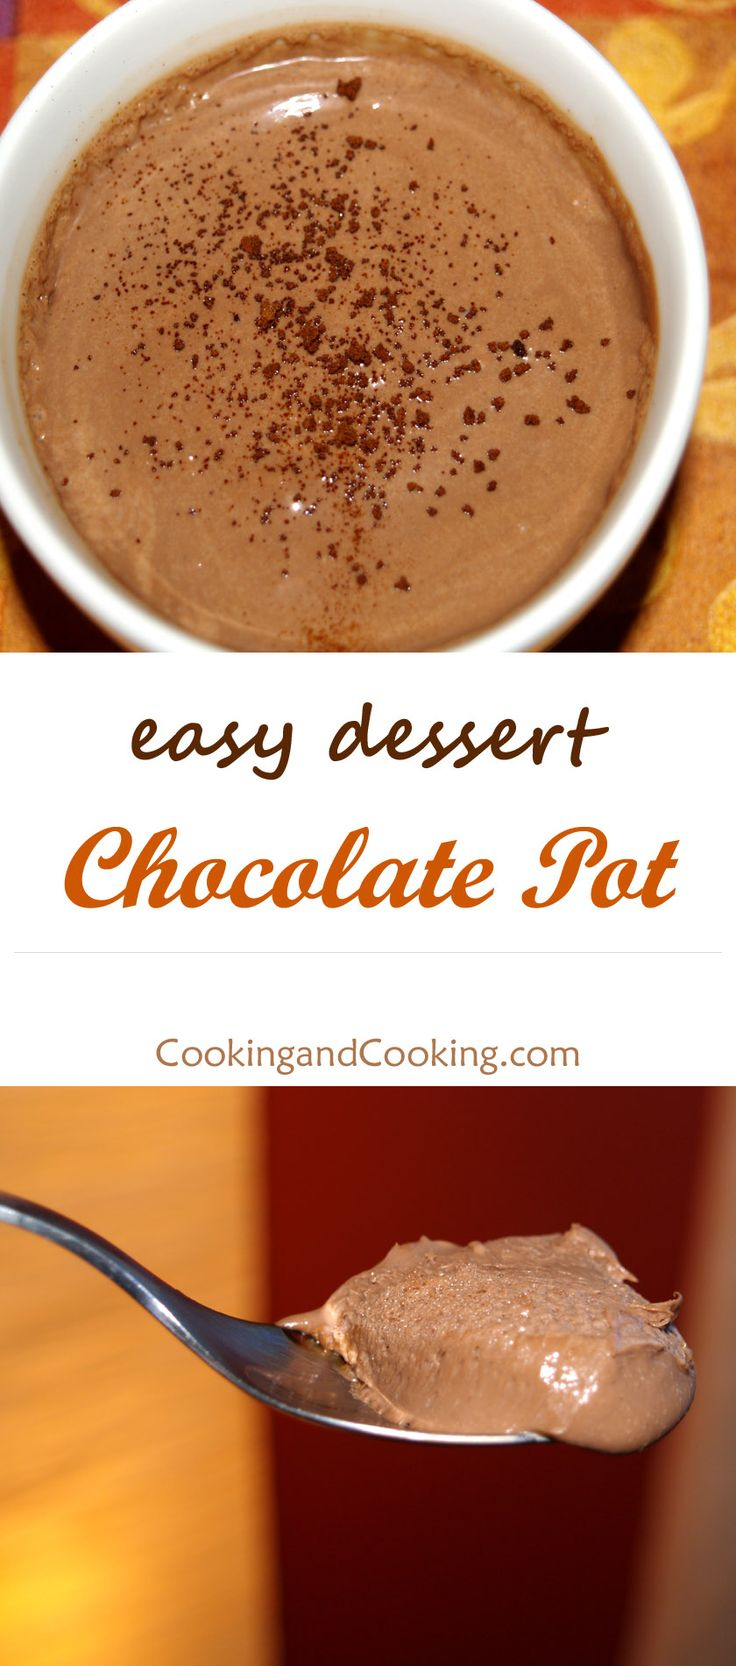 Top 25+ best Handmade chocolates ideas on Pinterest | Kahlua ...